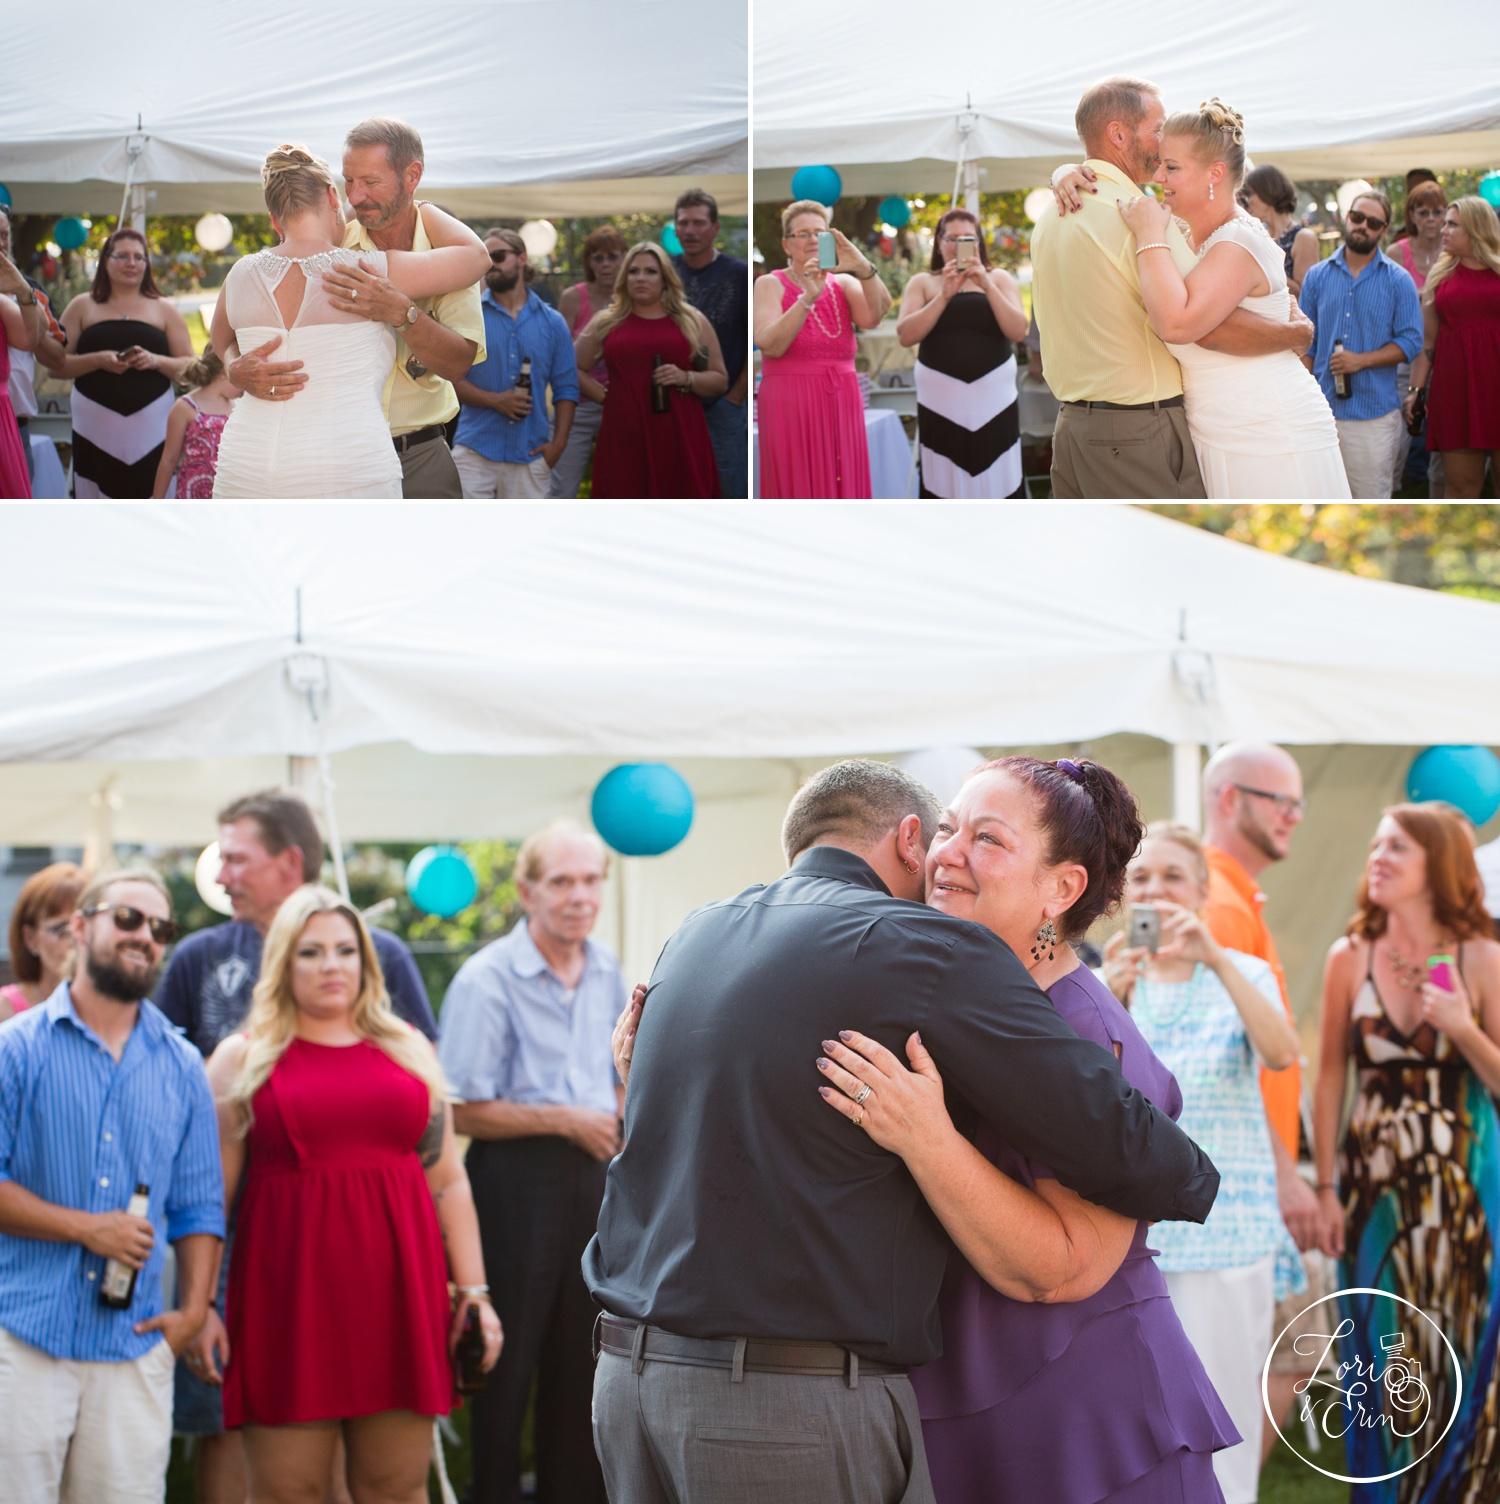 williamson_wedding_0251.jpg